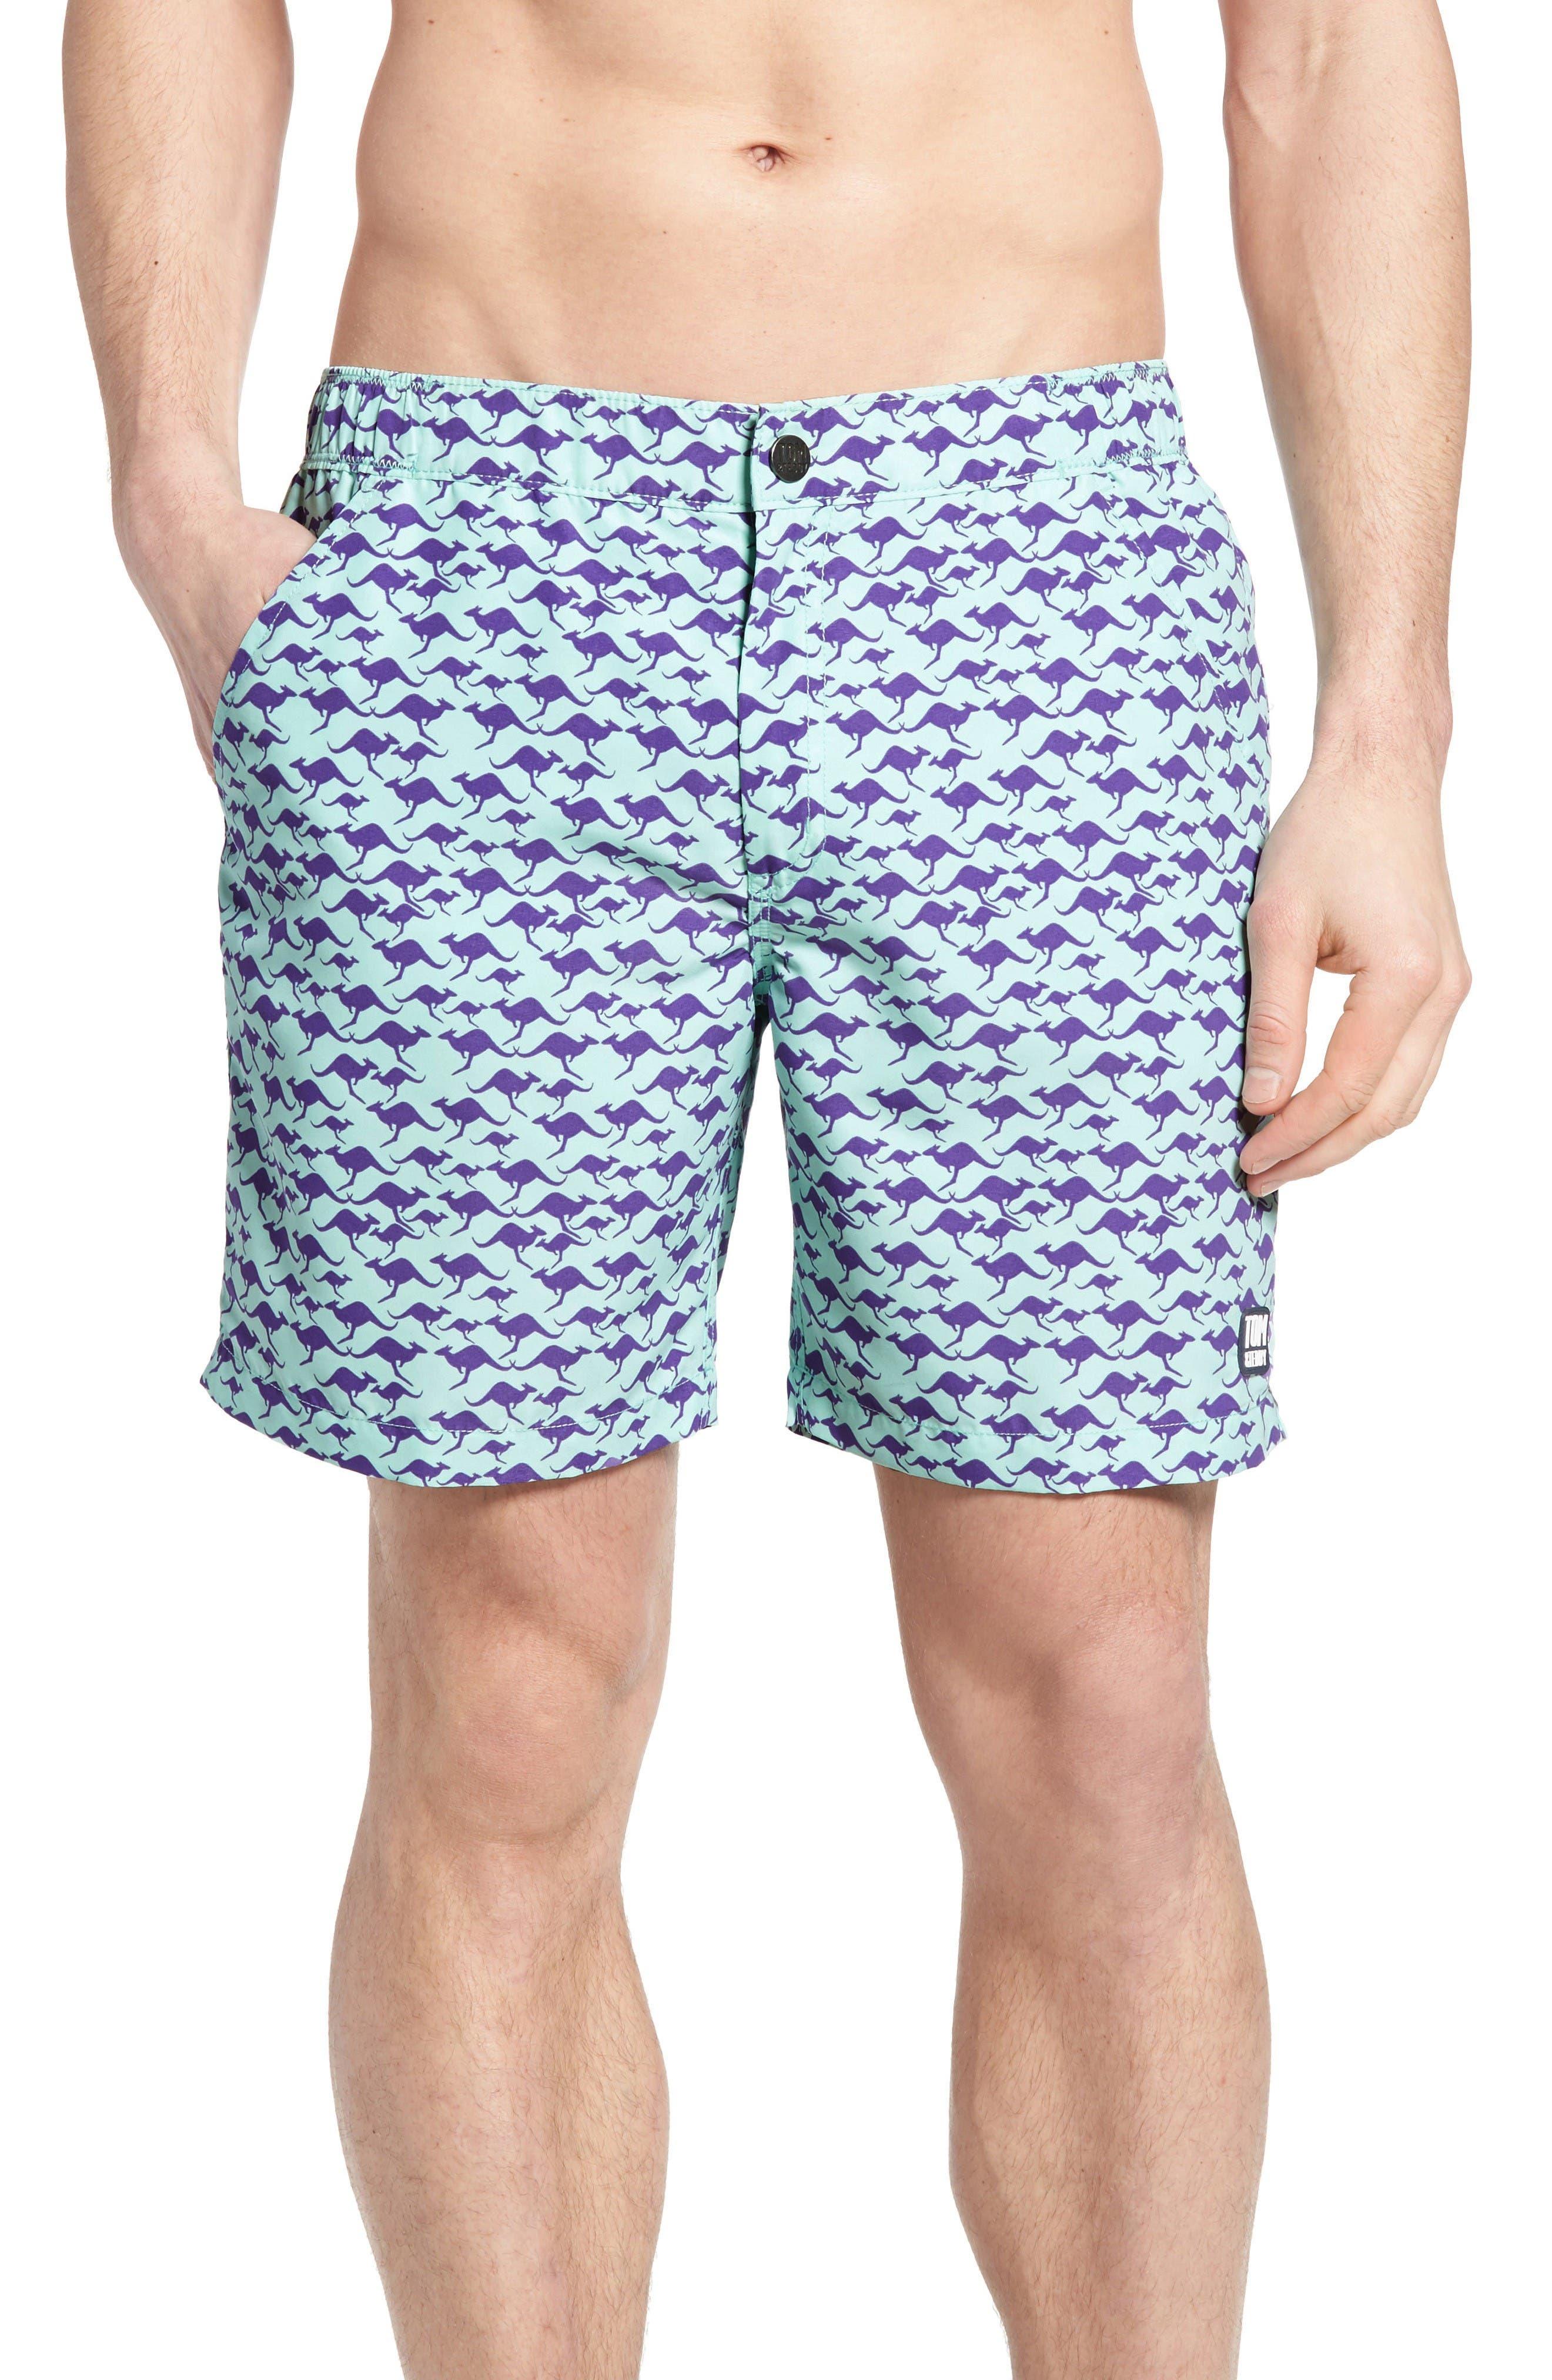 Tom & Teddy Kangaroo Print Swim Trunks